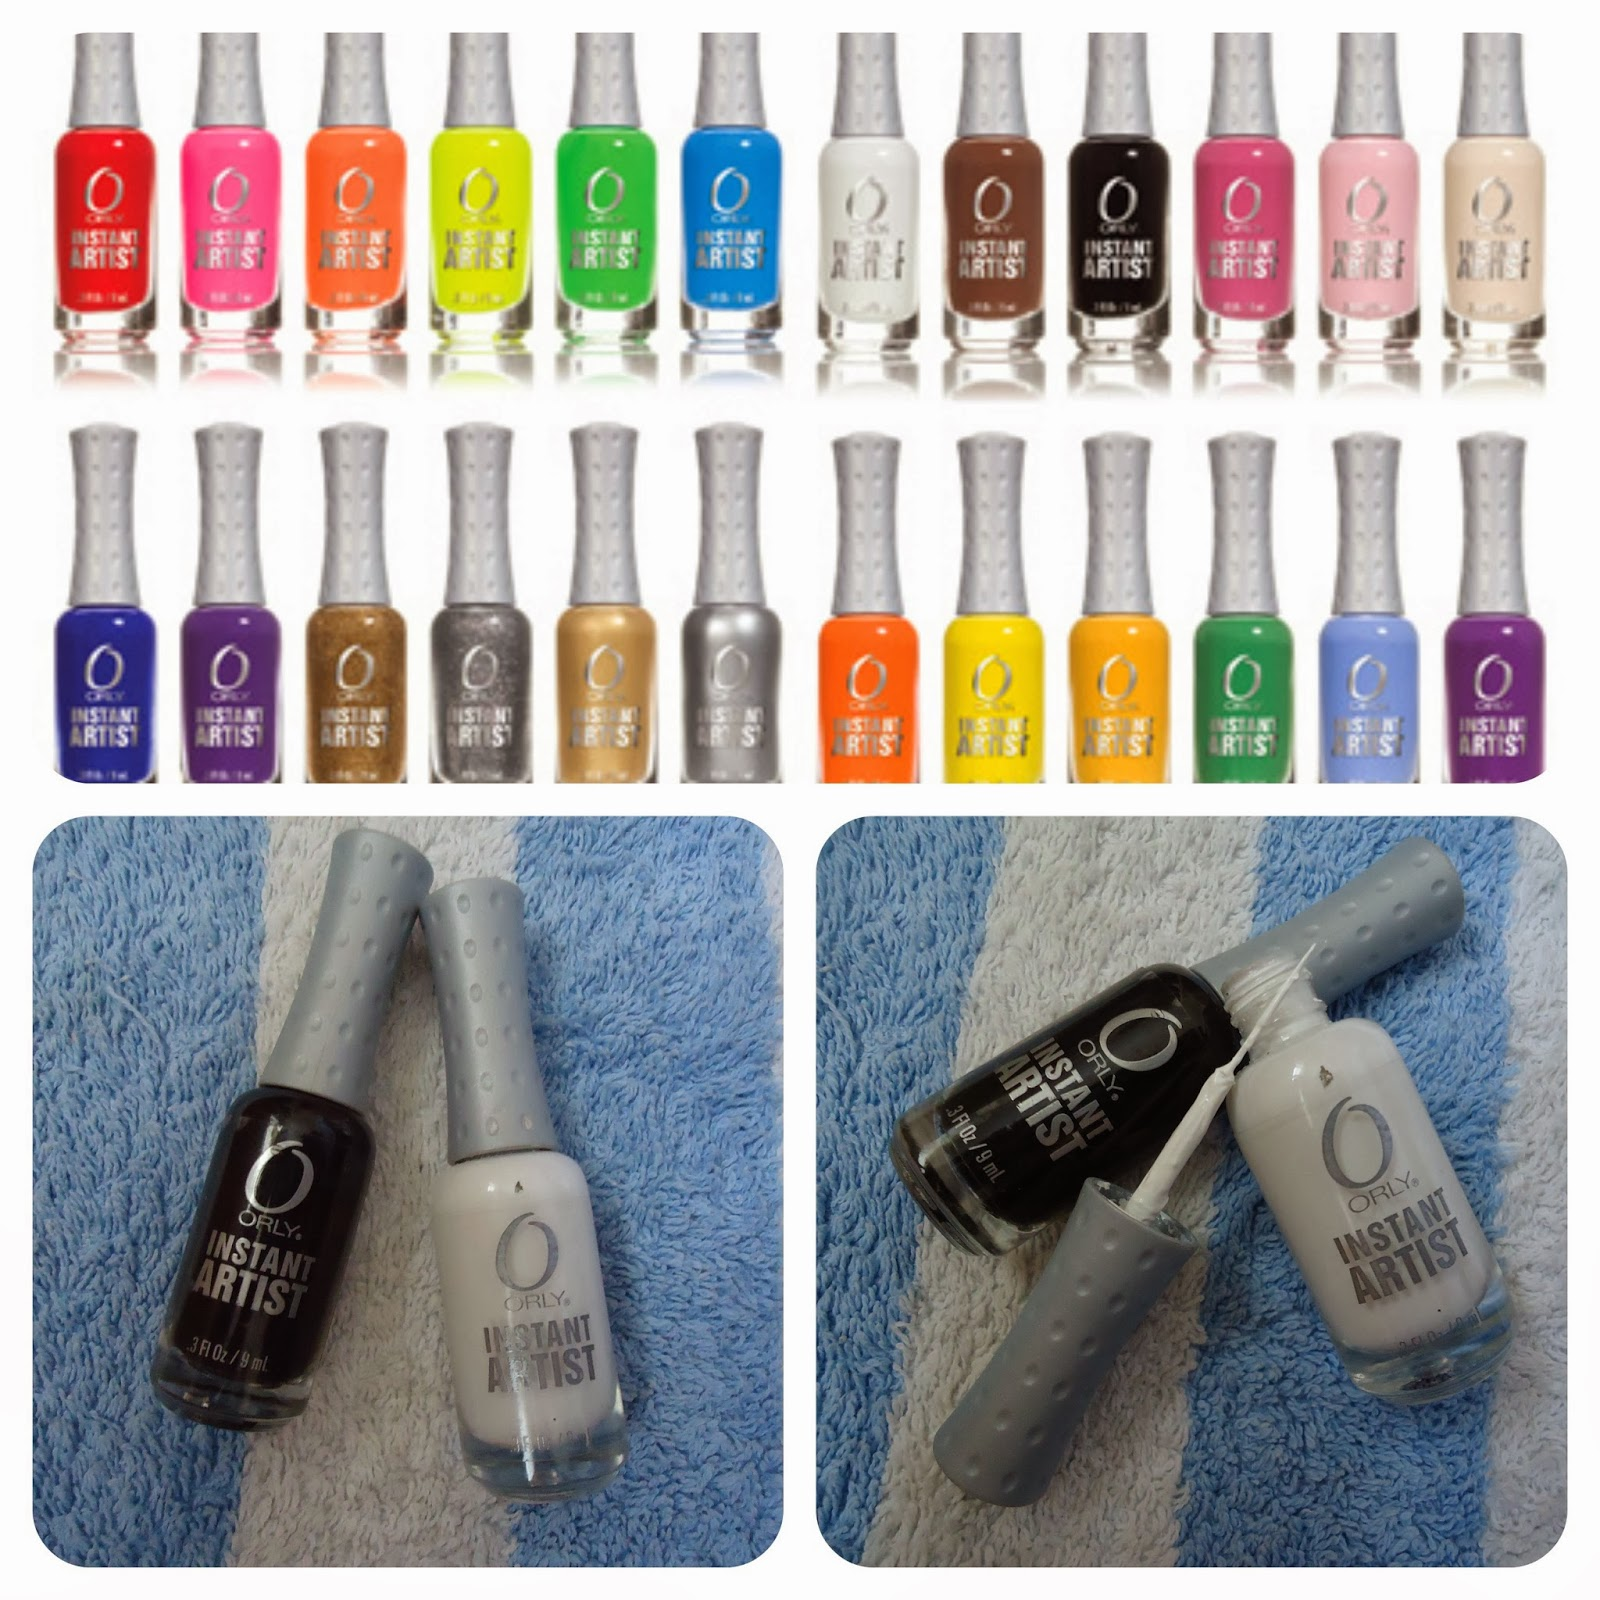 Beautyrobot A Comparison Of Nail Art Pens